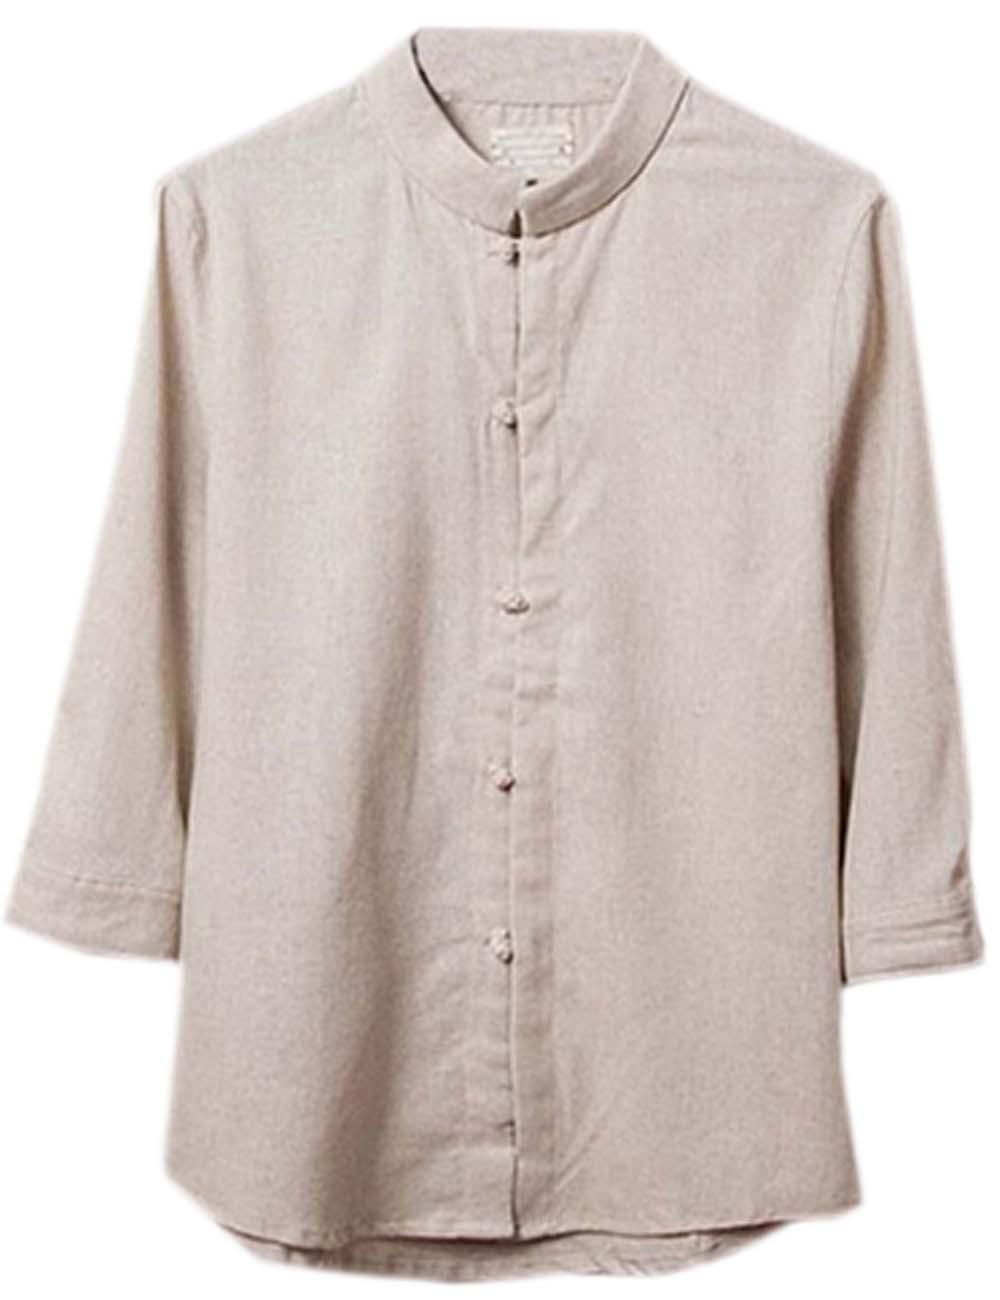 [BEIGE] Fashion Men Flax Chinese Short Sleeve KungFu Cloth Men Shirt,XXL